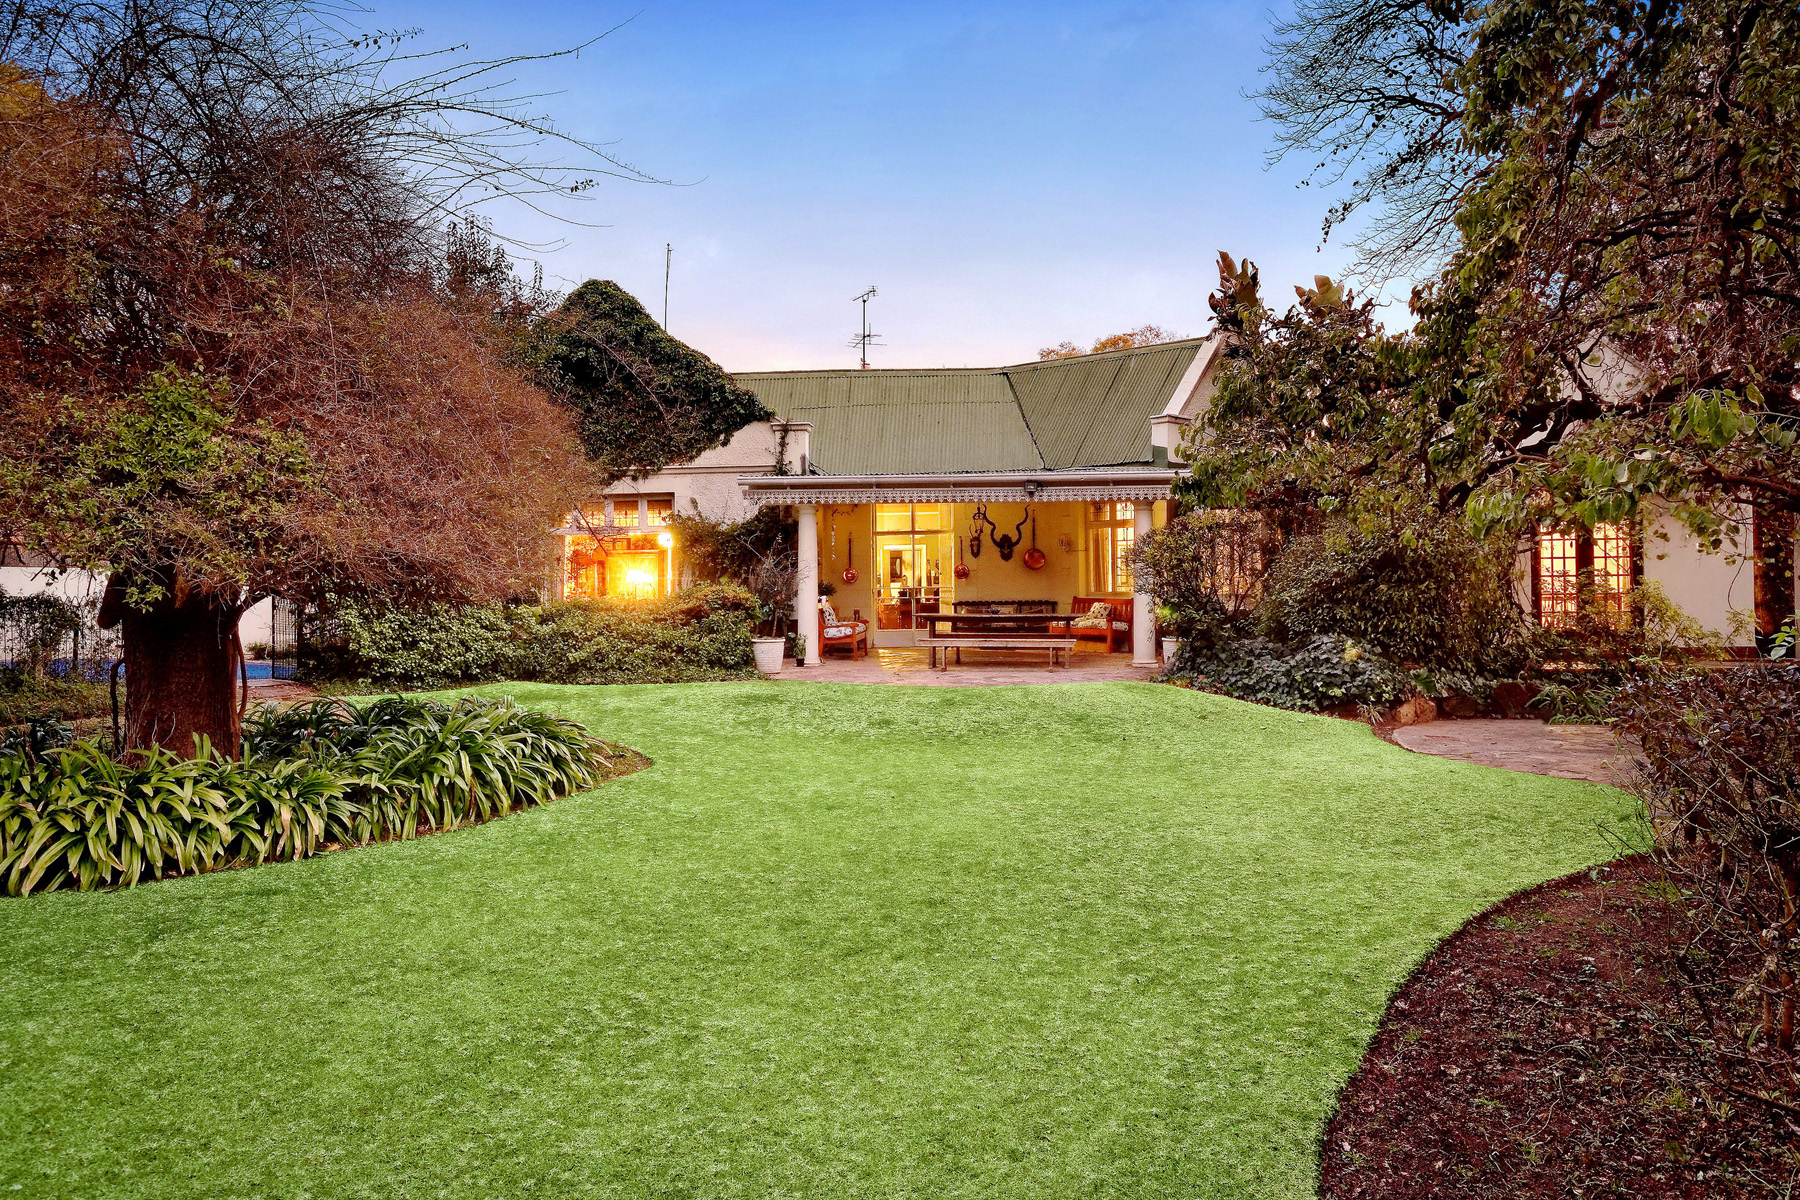 Farm / Ranch / Plantation for Sale at Historical Acclaimed Farmhouse Johannesburg, Gauteng, 2192 South Africa